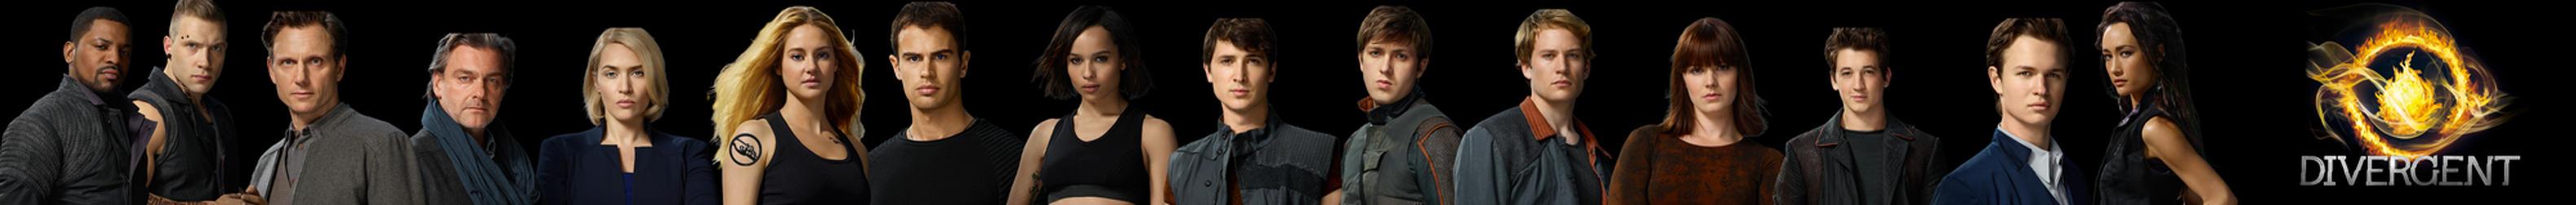 Divergent Film Characters Banner by nickelbackloverxoxox